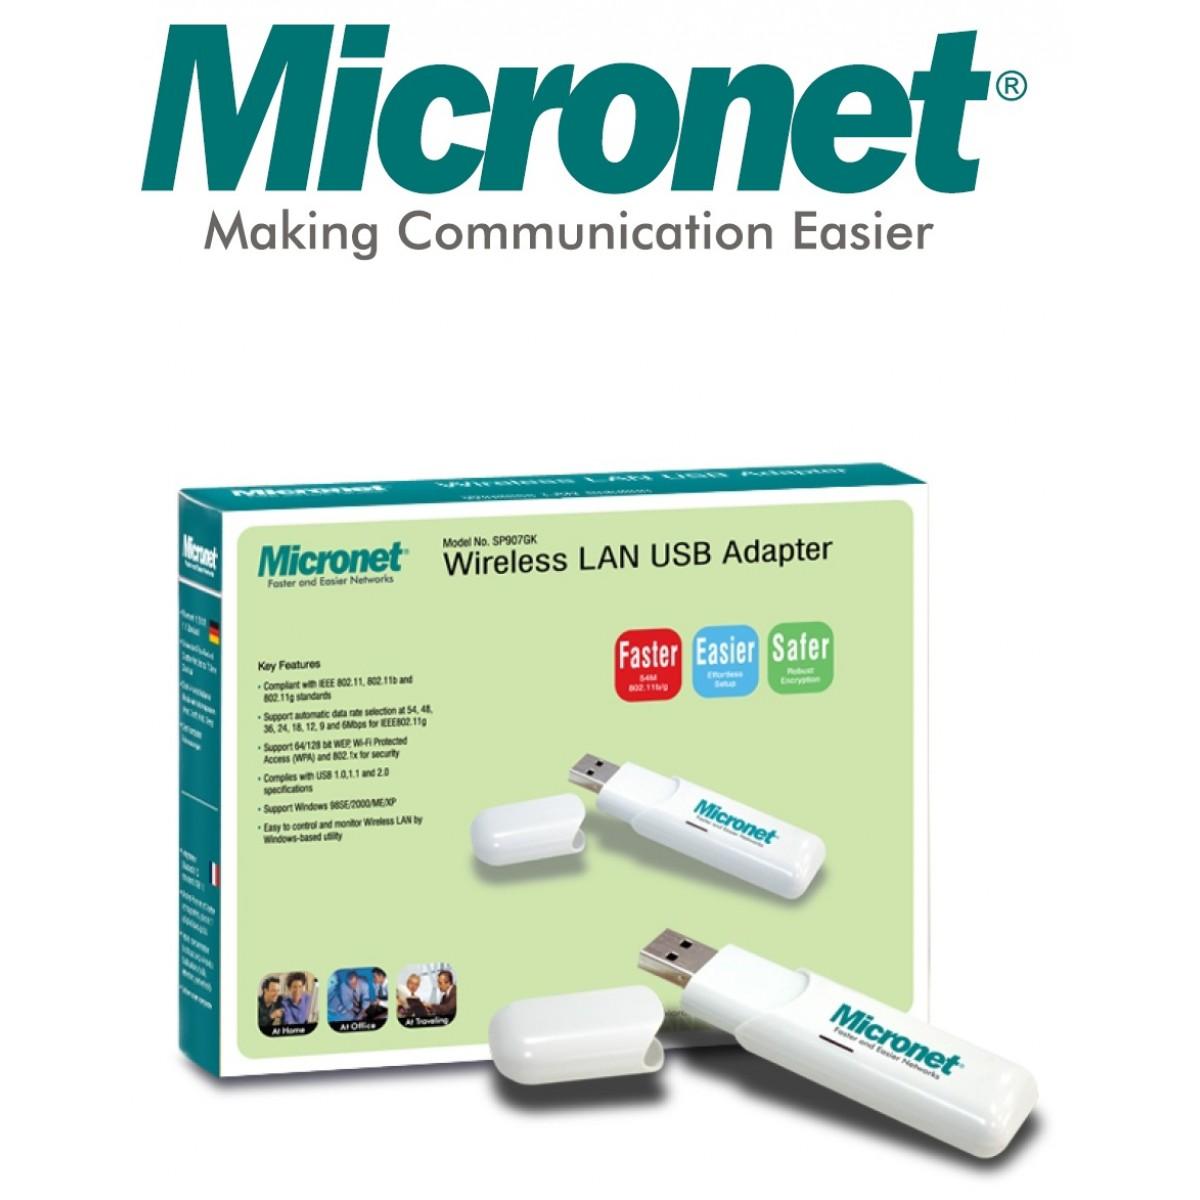 MICRONET SP907GK USB Wireless Adapter